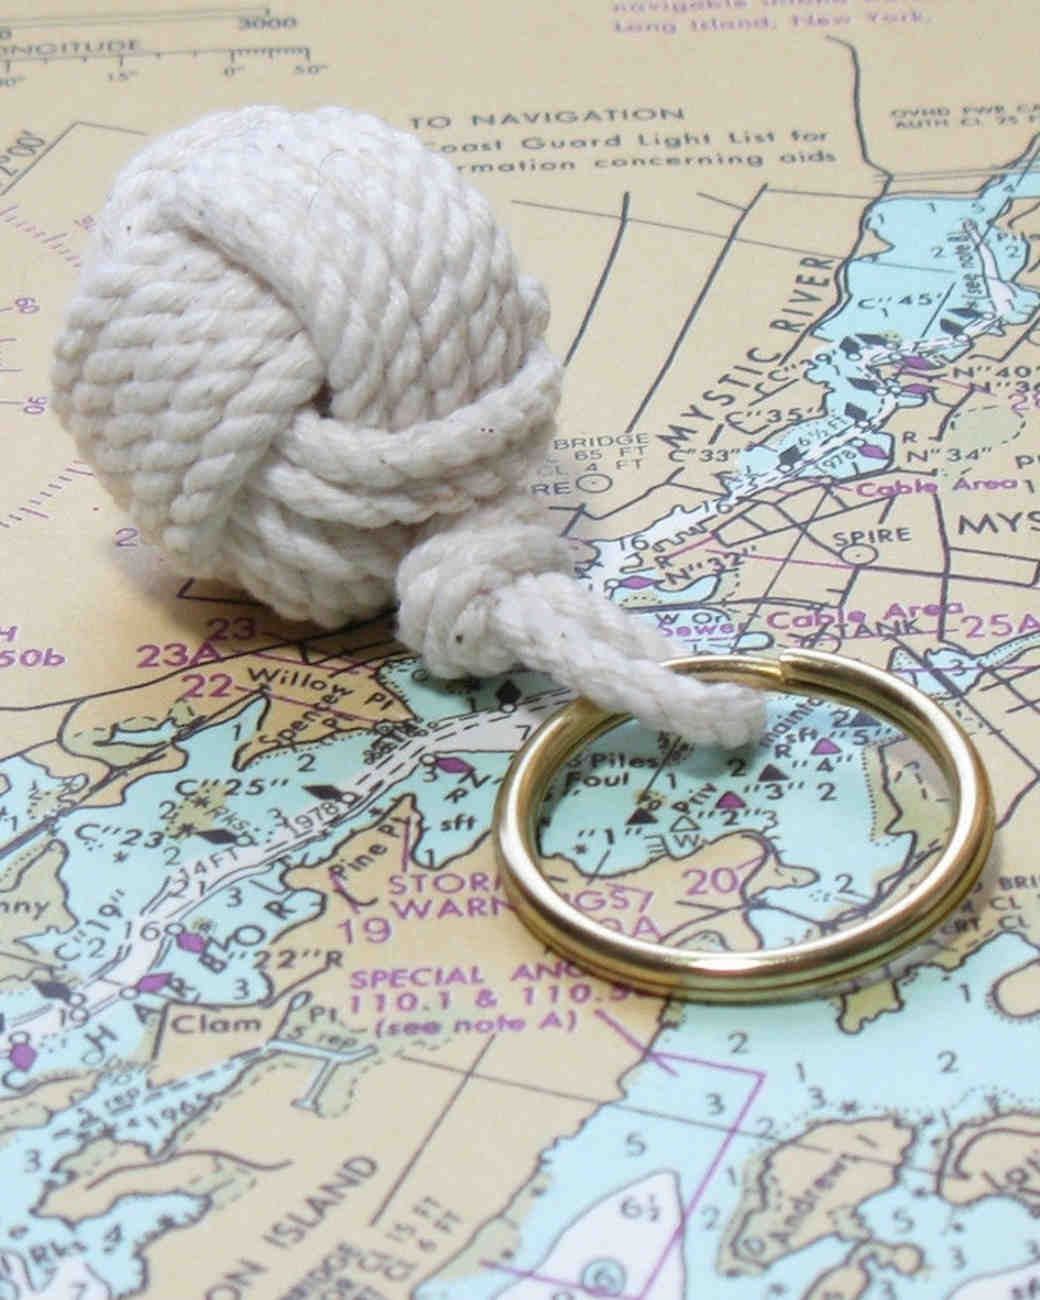 groomsmen-gift-ideas-mystic-knotworks-keychain-0614.jpg